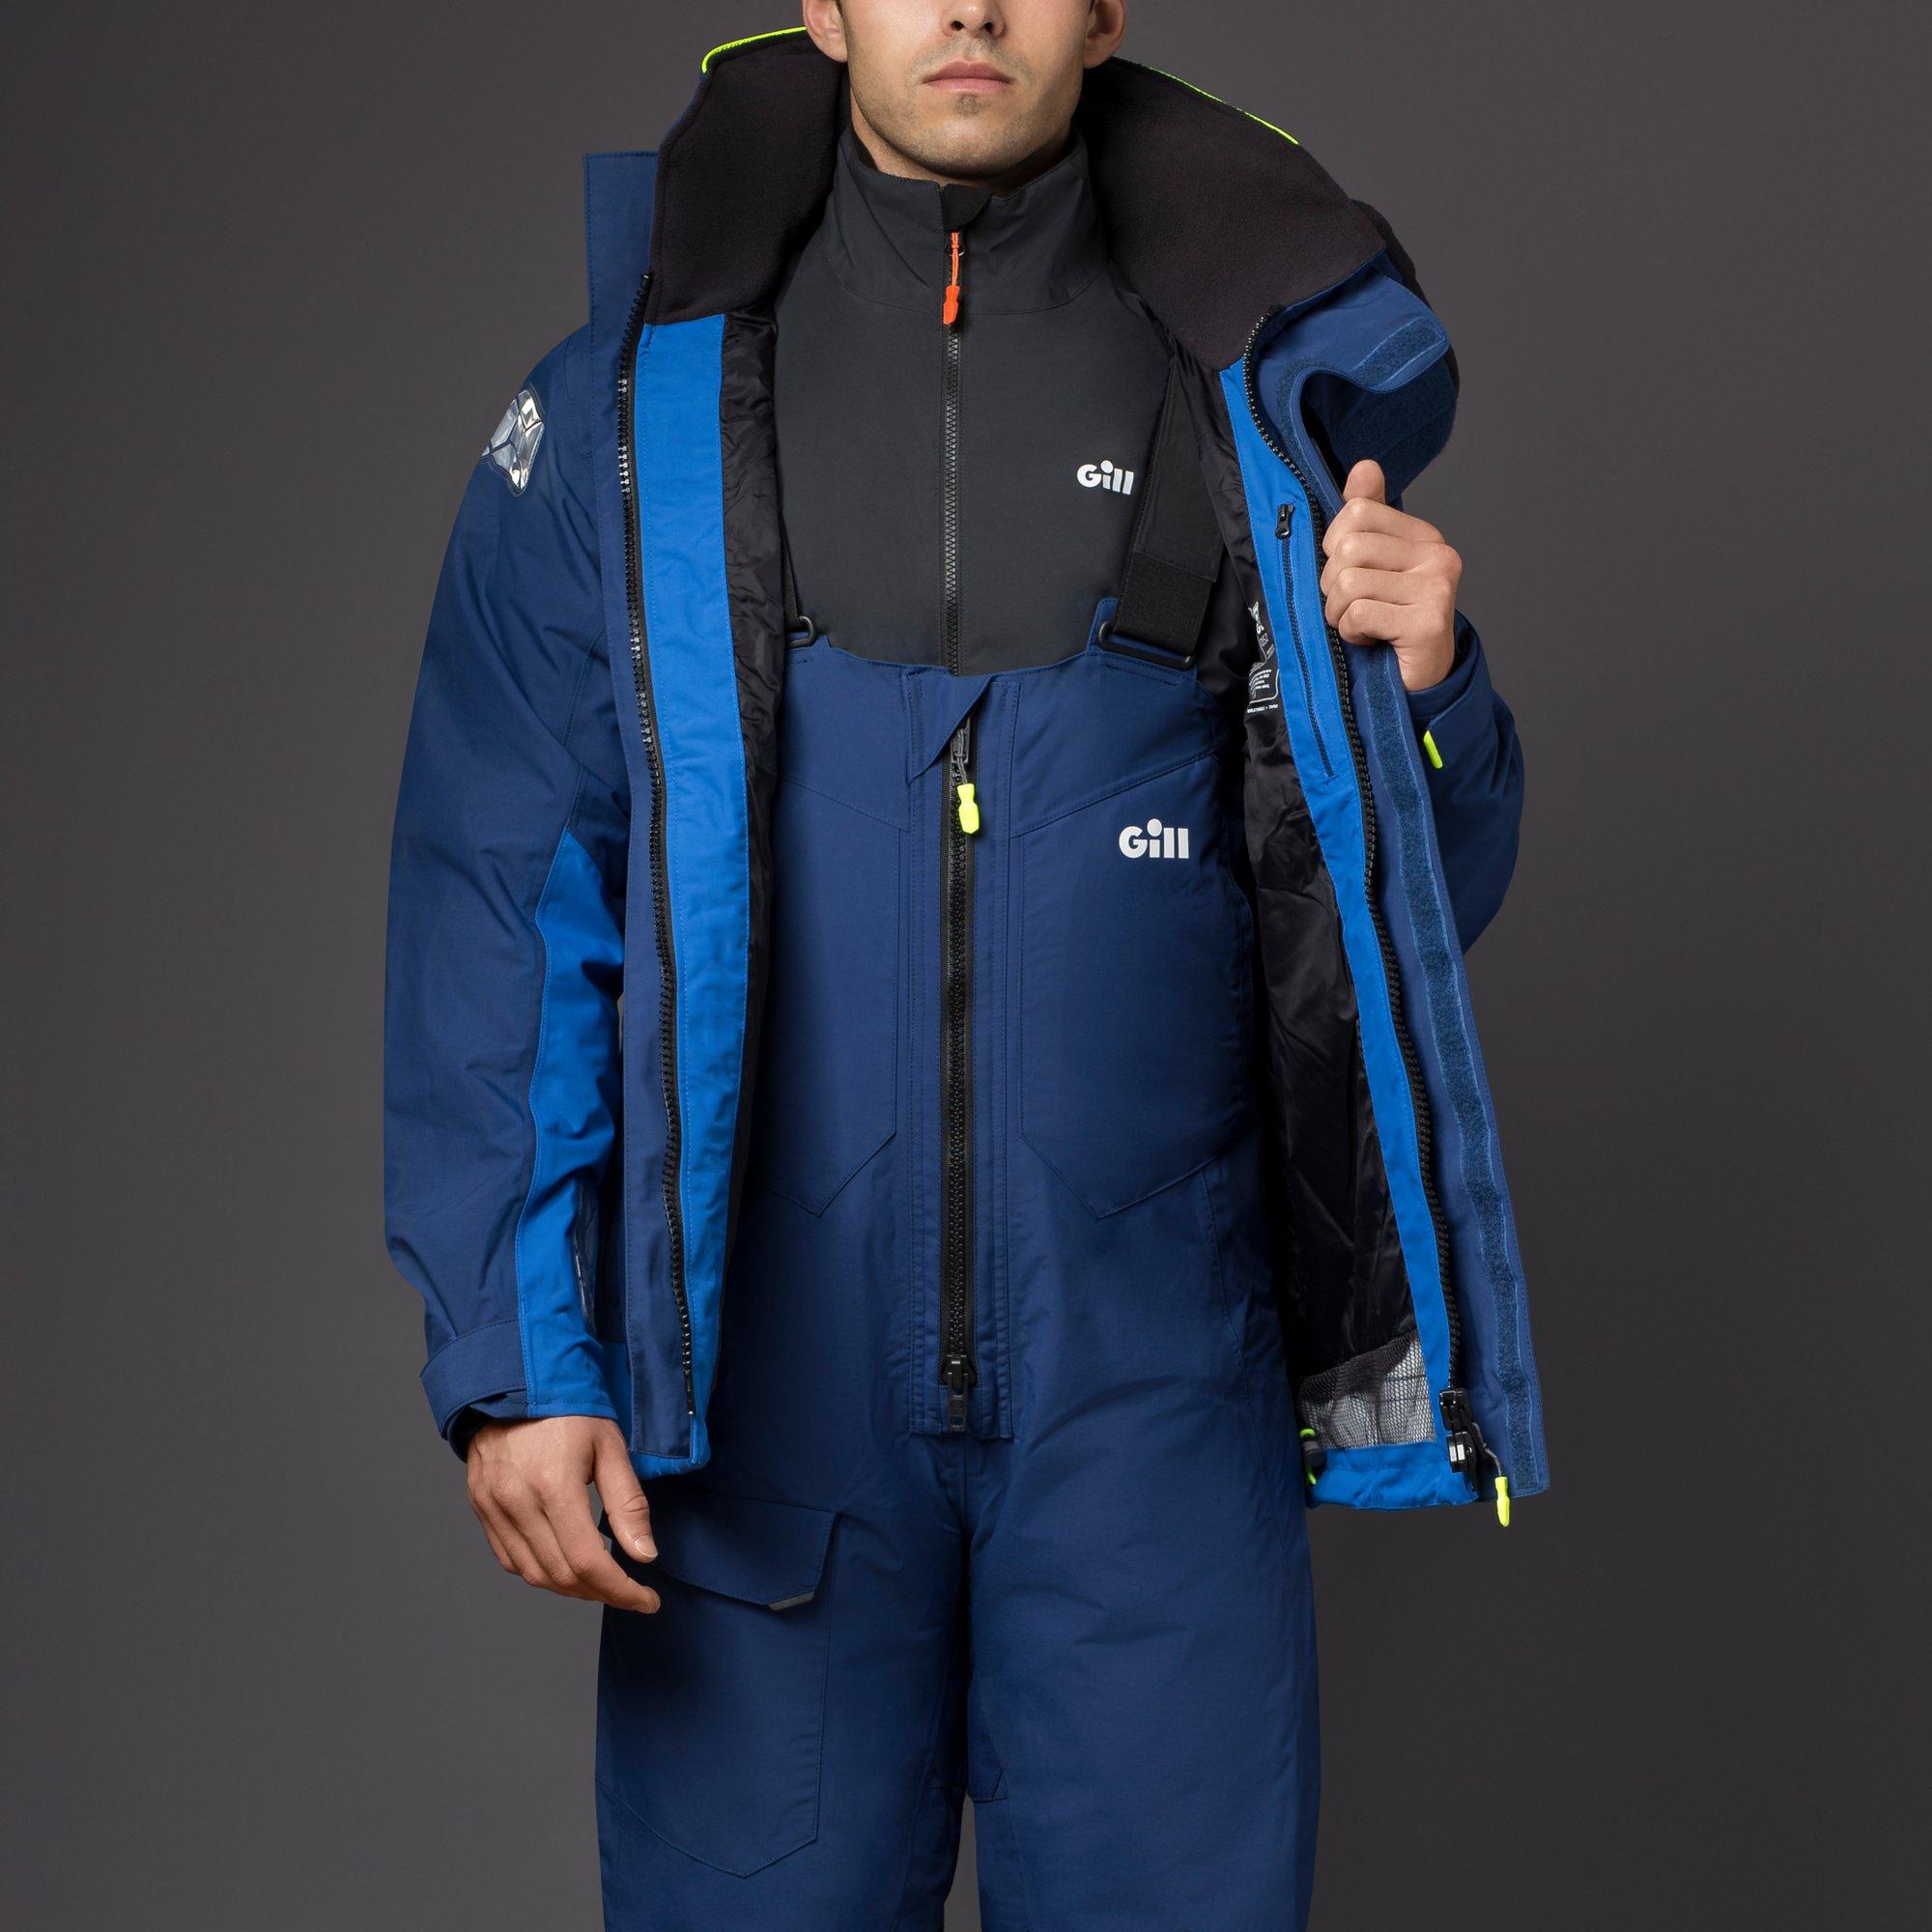 OS2 Offshore Men's Trousers - OS24T-BLU32-MODEL-5.jpg